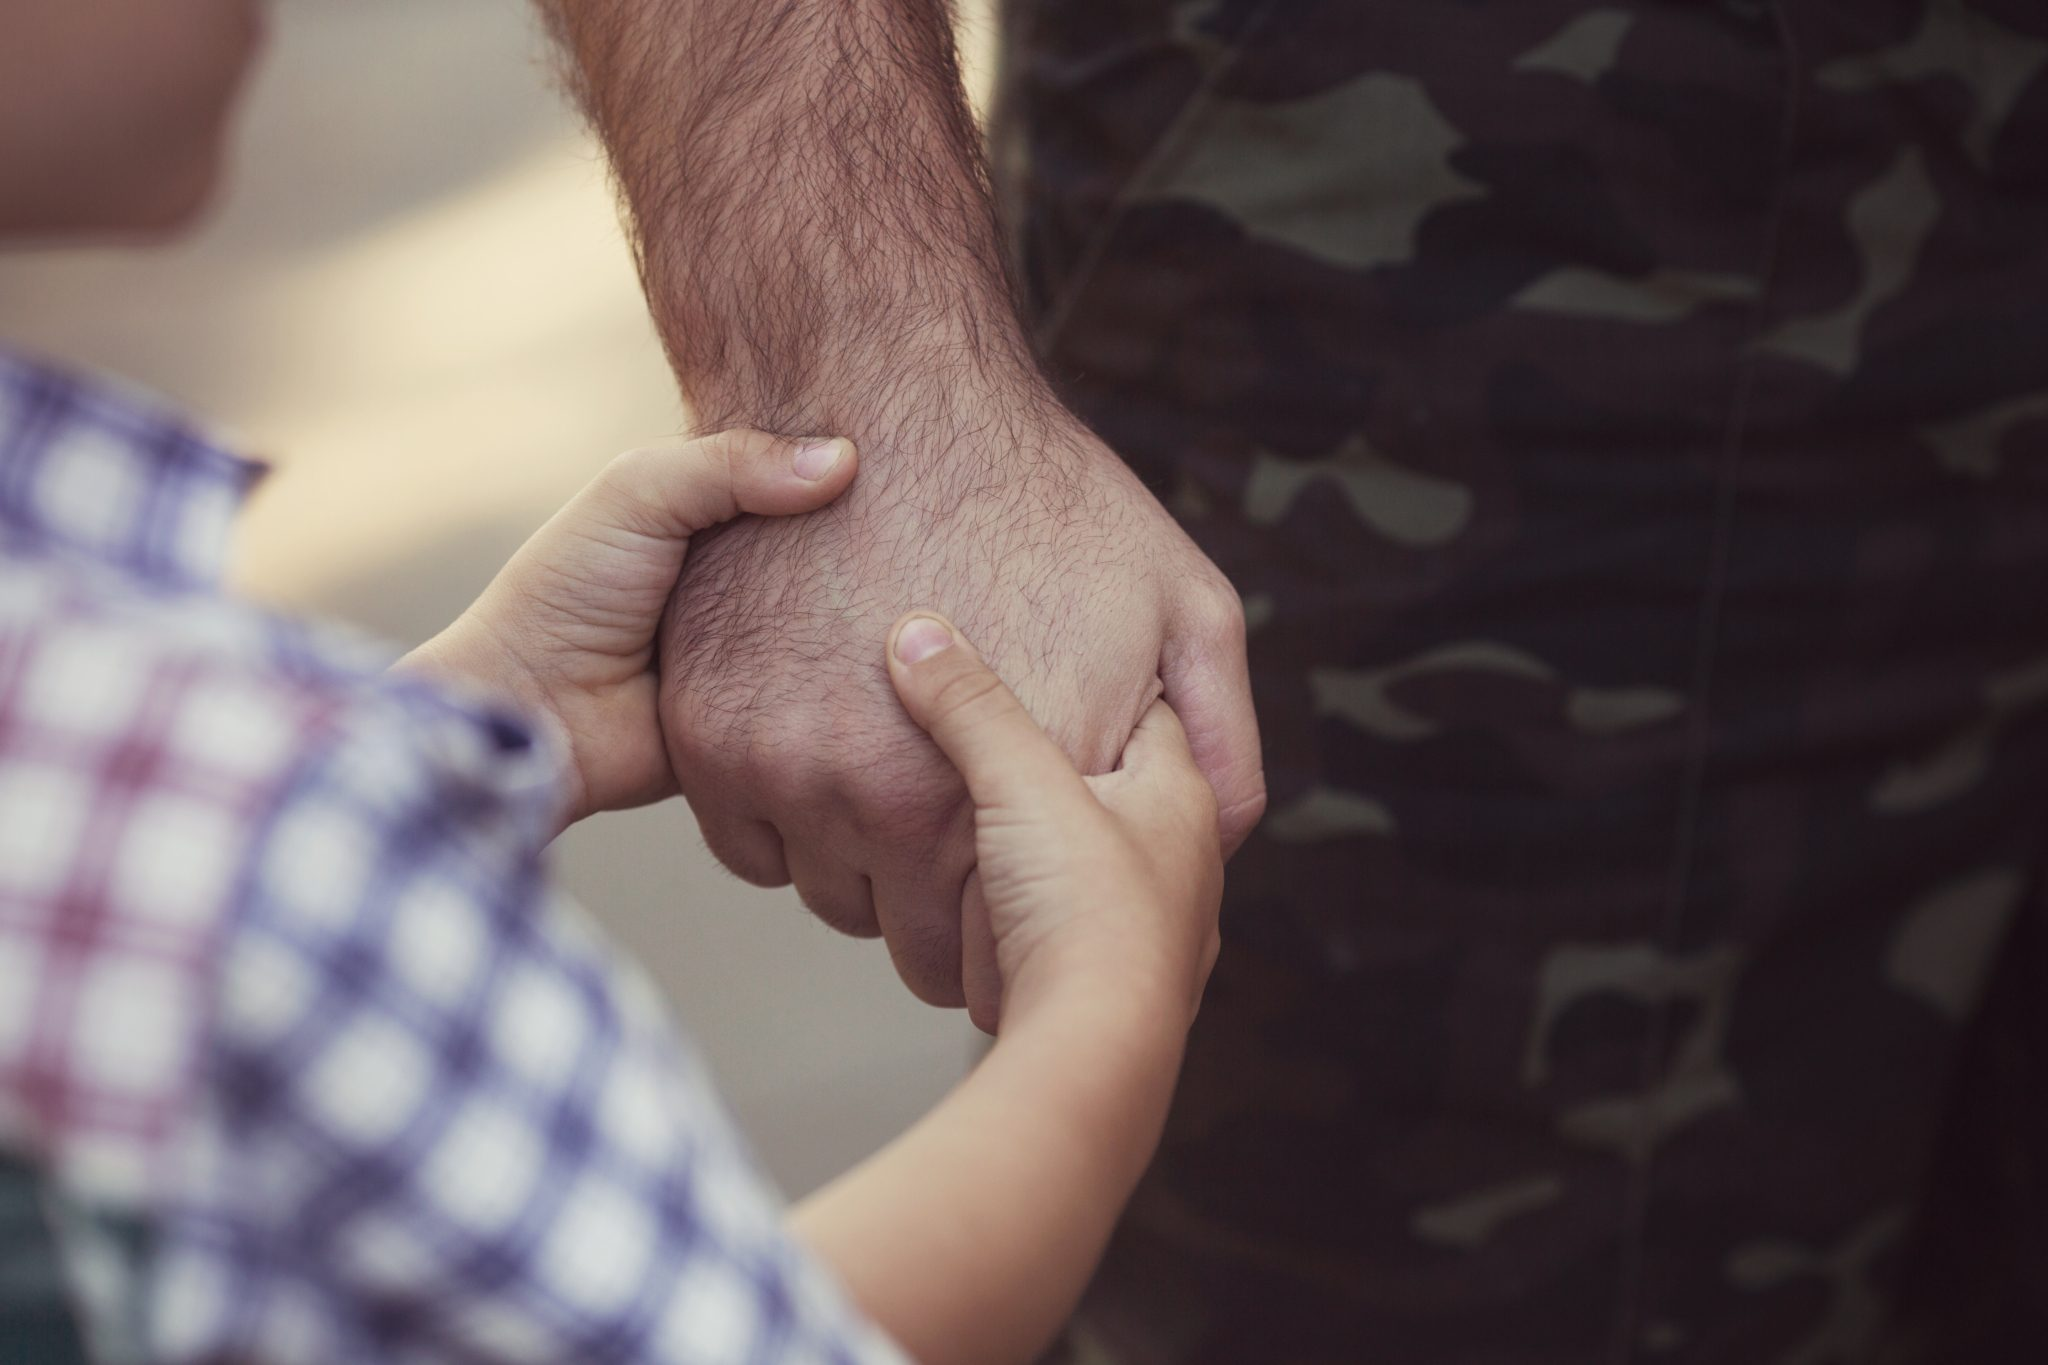 Veterans' Burial Benefits FAQ - Funeral Basics